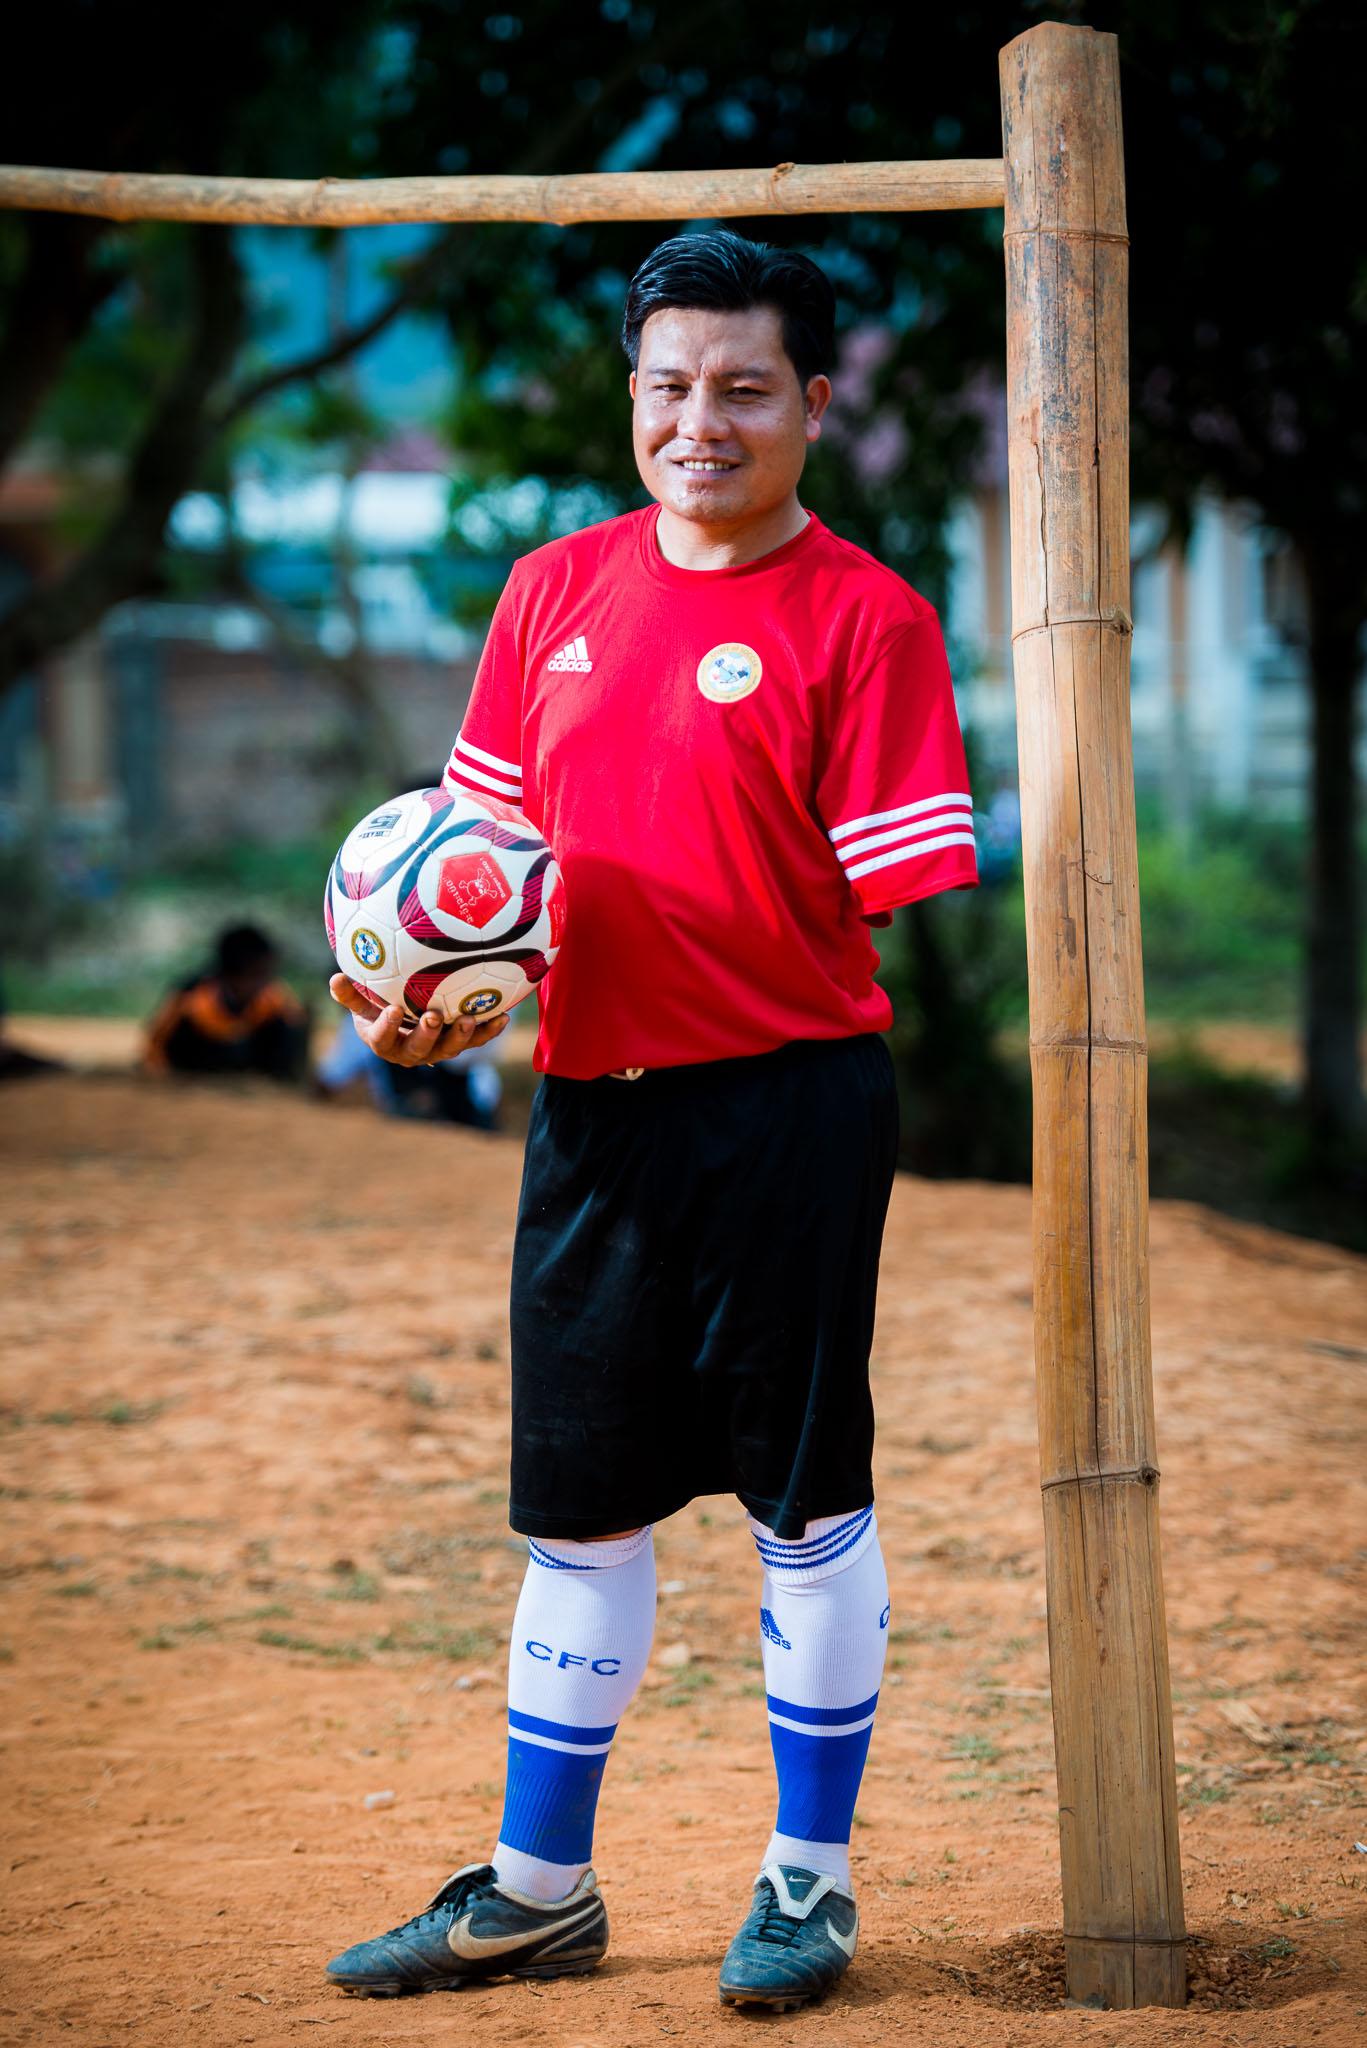 Spirit of Soccer coach, Laos, April 2015